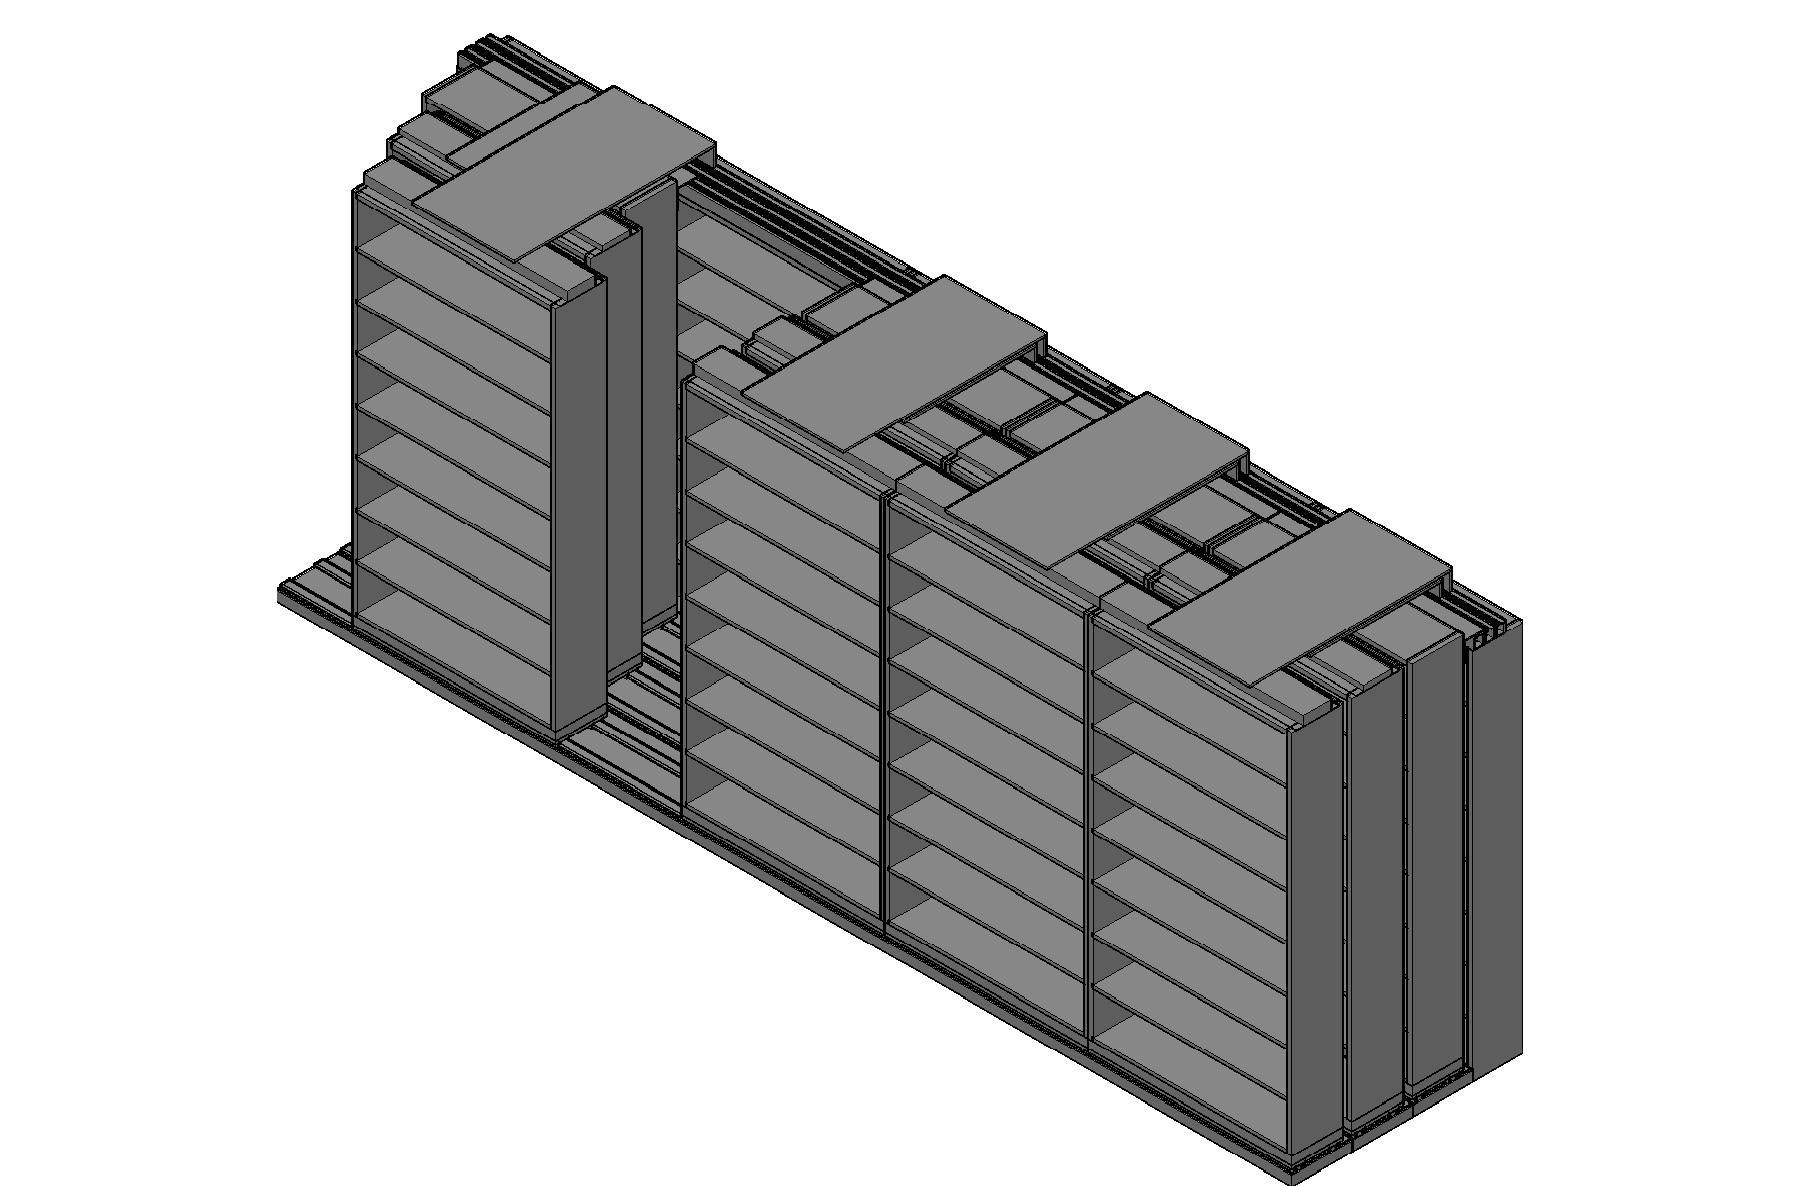 "Letter Size Sliding Shelves - 4 Rows Deep - 8 Levels - (48"" x 12"" Shelves) - 244"" Total Width"